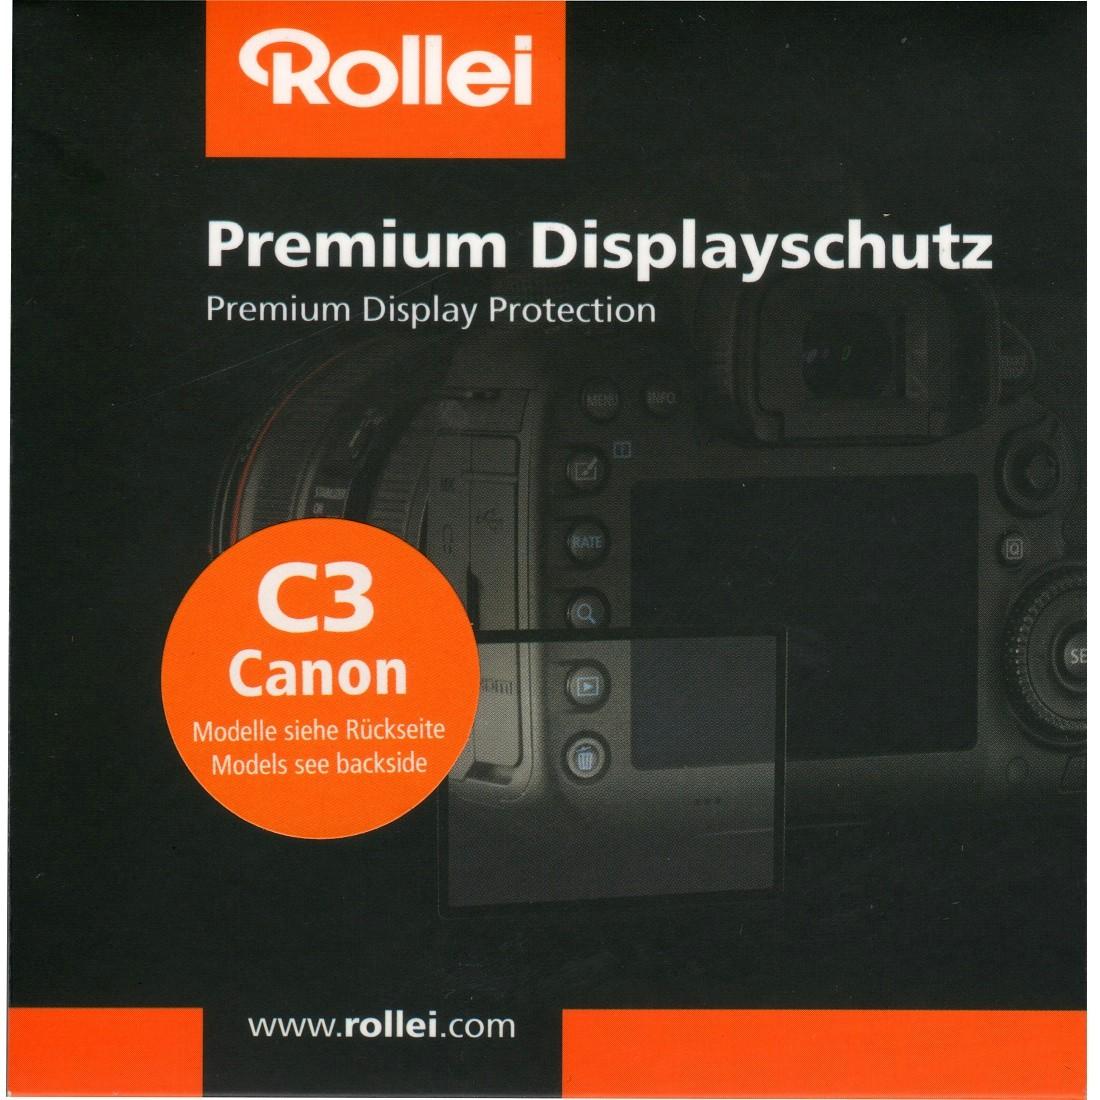 Rollei Premium Displayschutz C3 Canon 6D